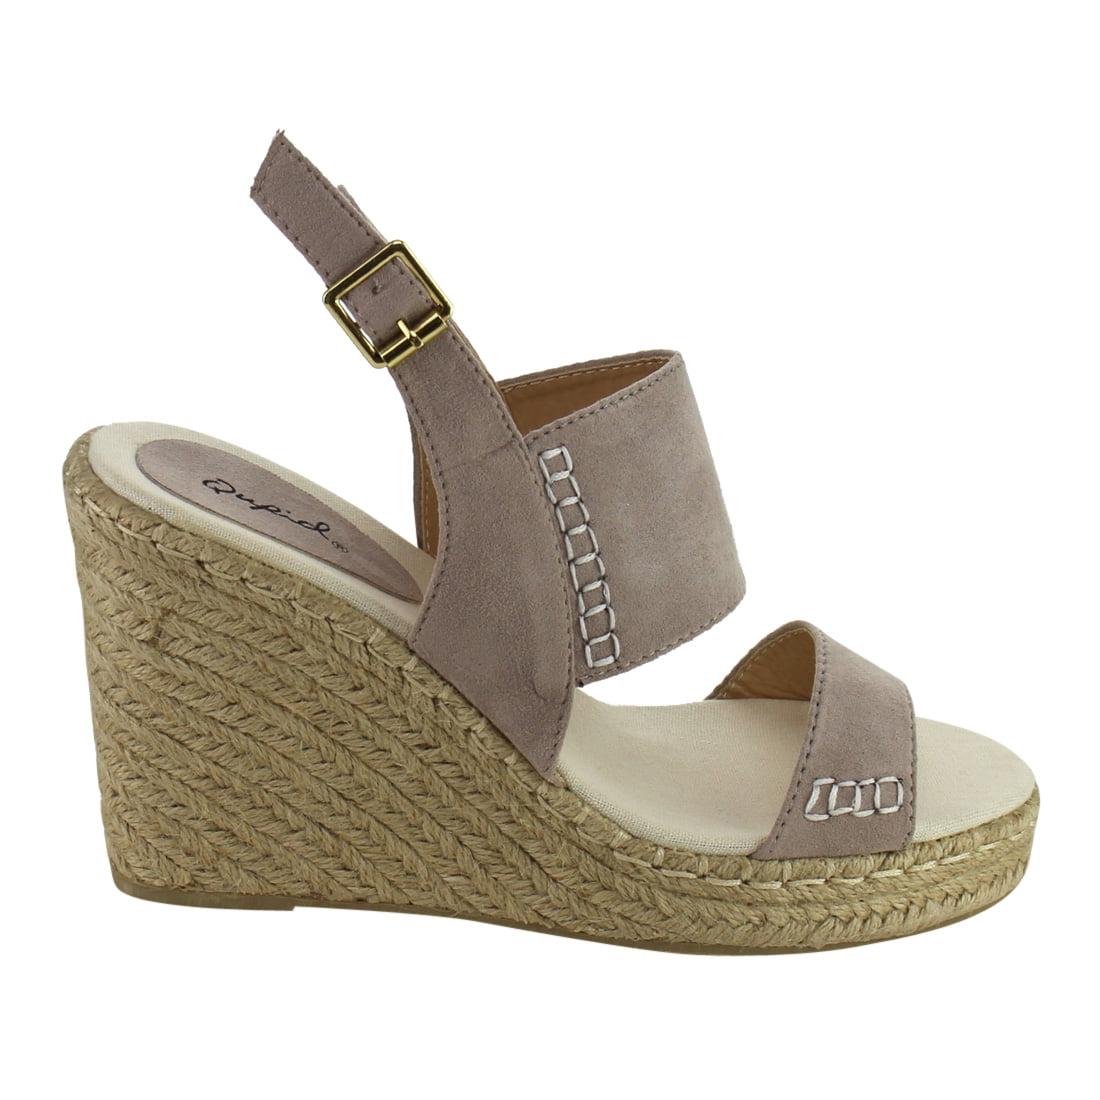 QUPID FG61 Women's Platform Slingback Stitched Espadrille Platform Women's Wedge Sandals 6a33ff